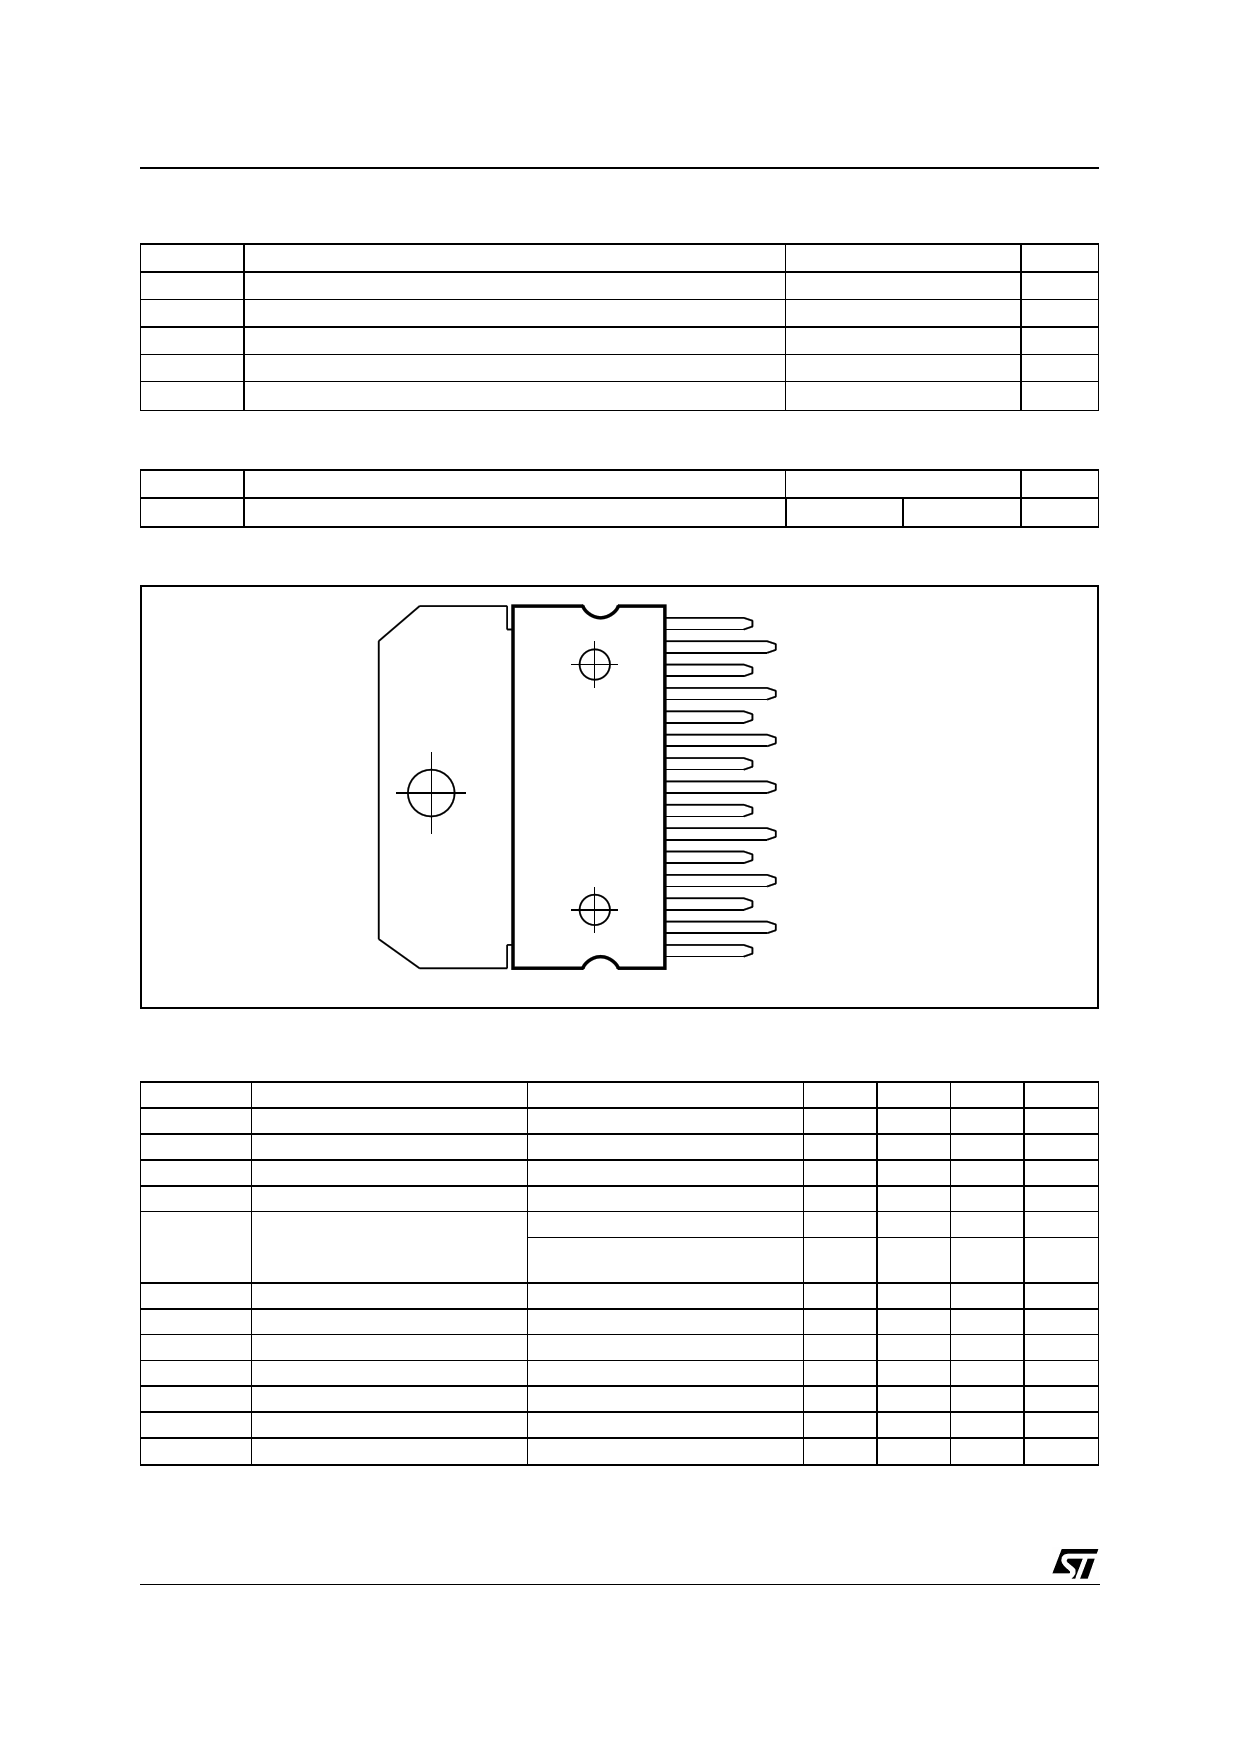 TDA7297 pdf schematic